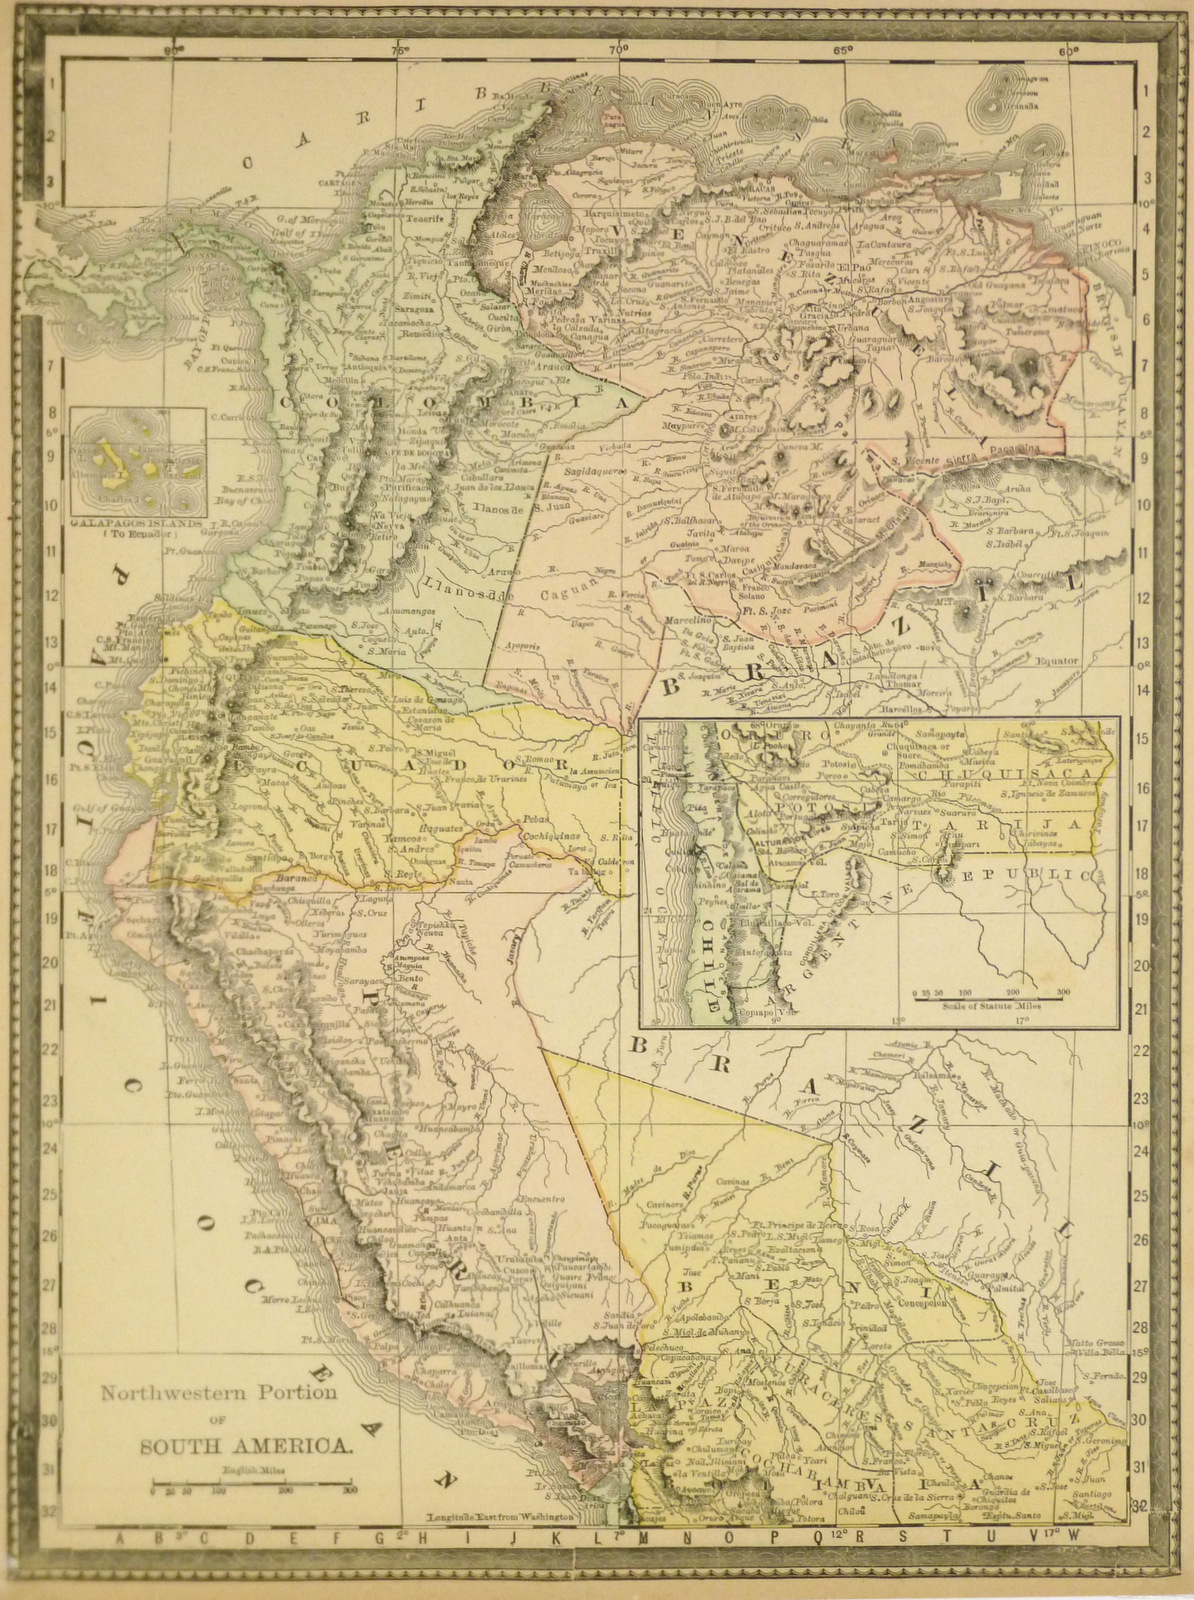 Northern South America 1890 Original Art Antique Maps Prints